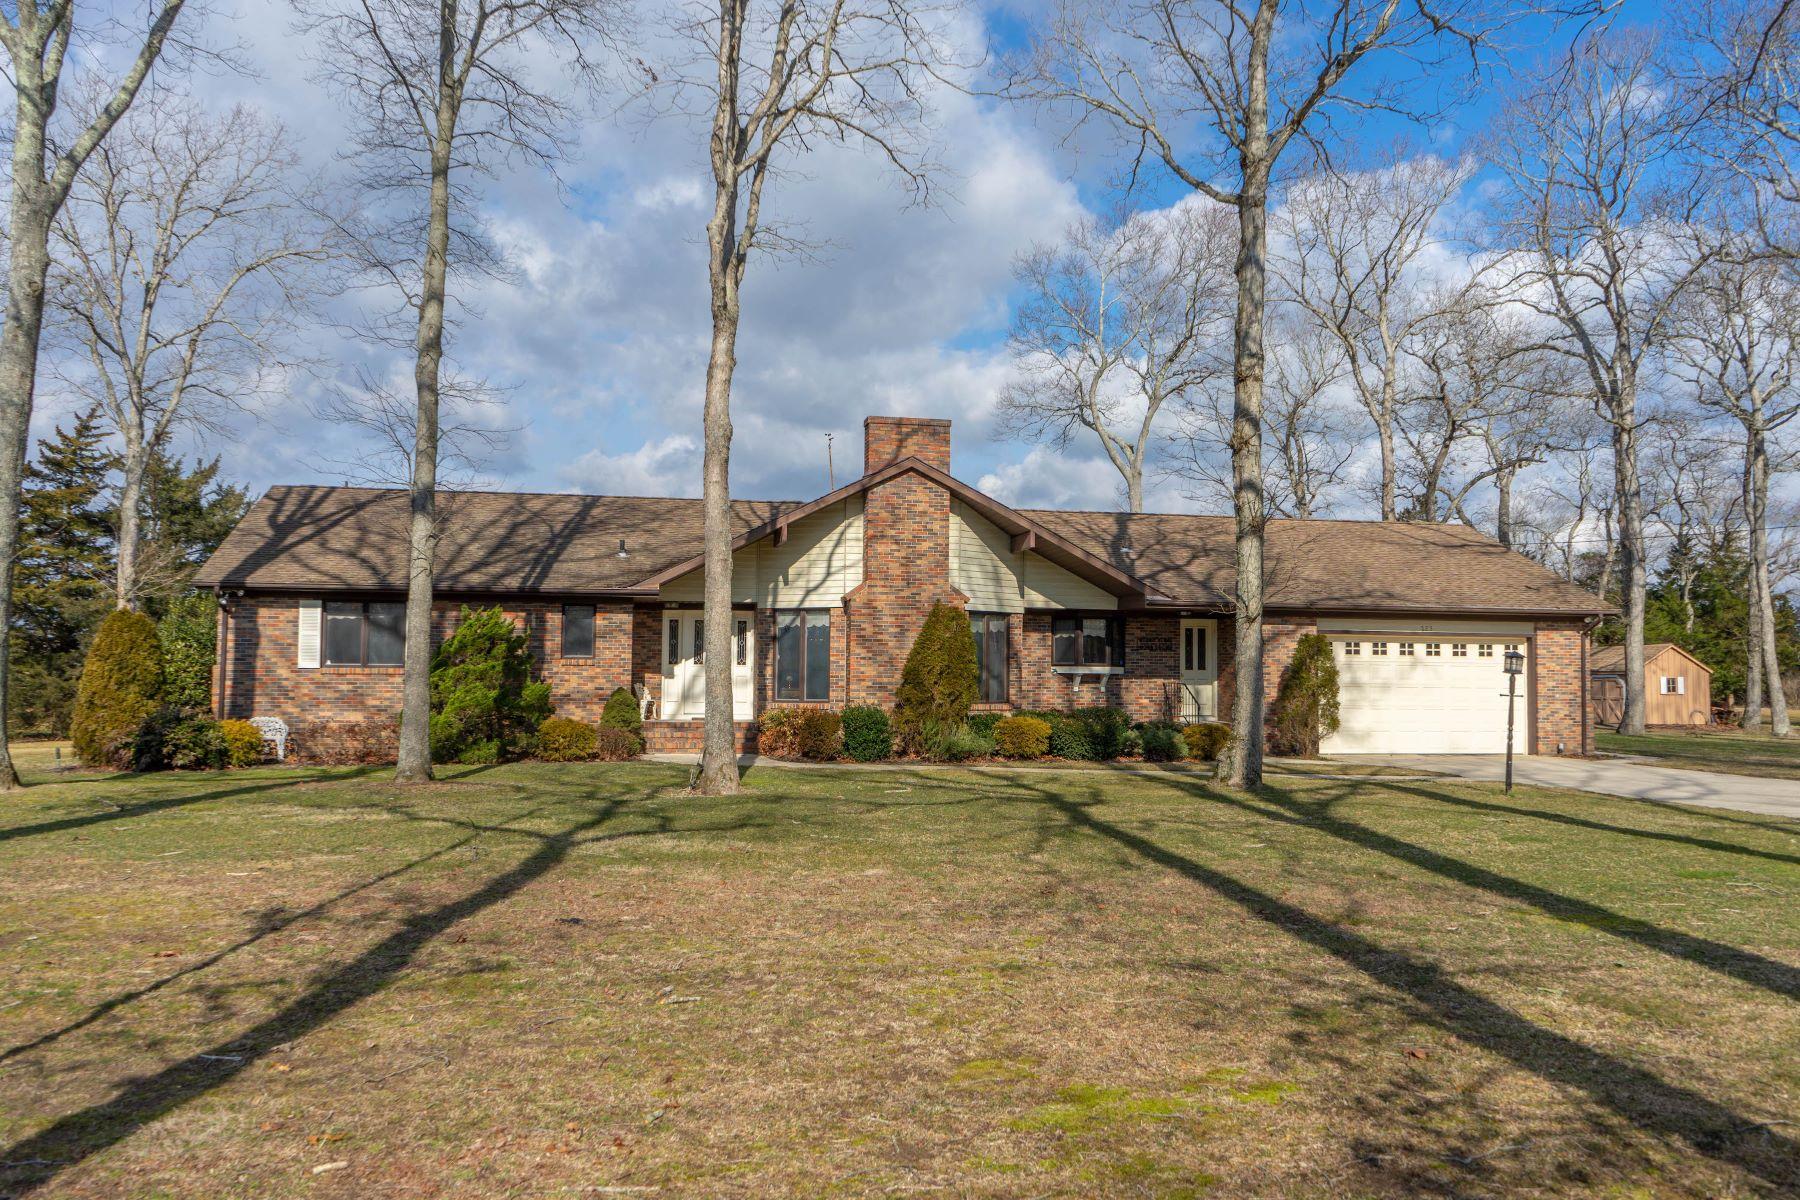 Single Family Homes для того Продажа на Immaculate Estate 223 Corson Tavern Road, South Seaville, Нью-Джерси 08246 Соединенные Штаты